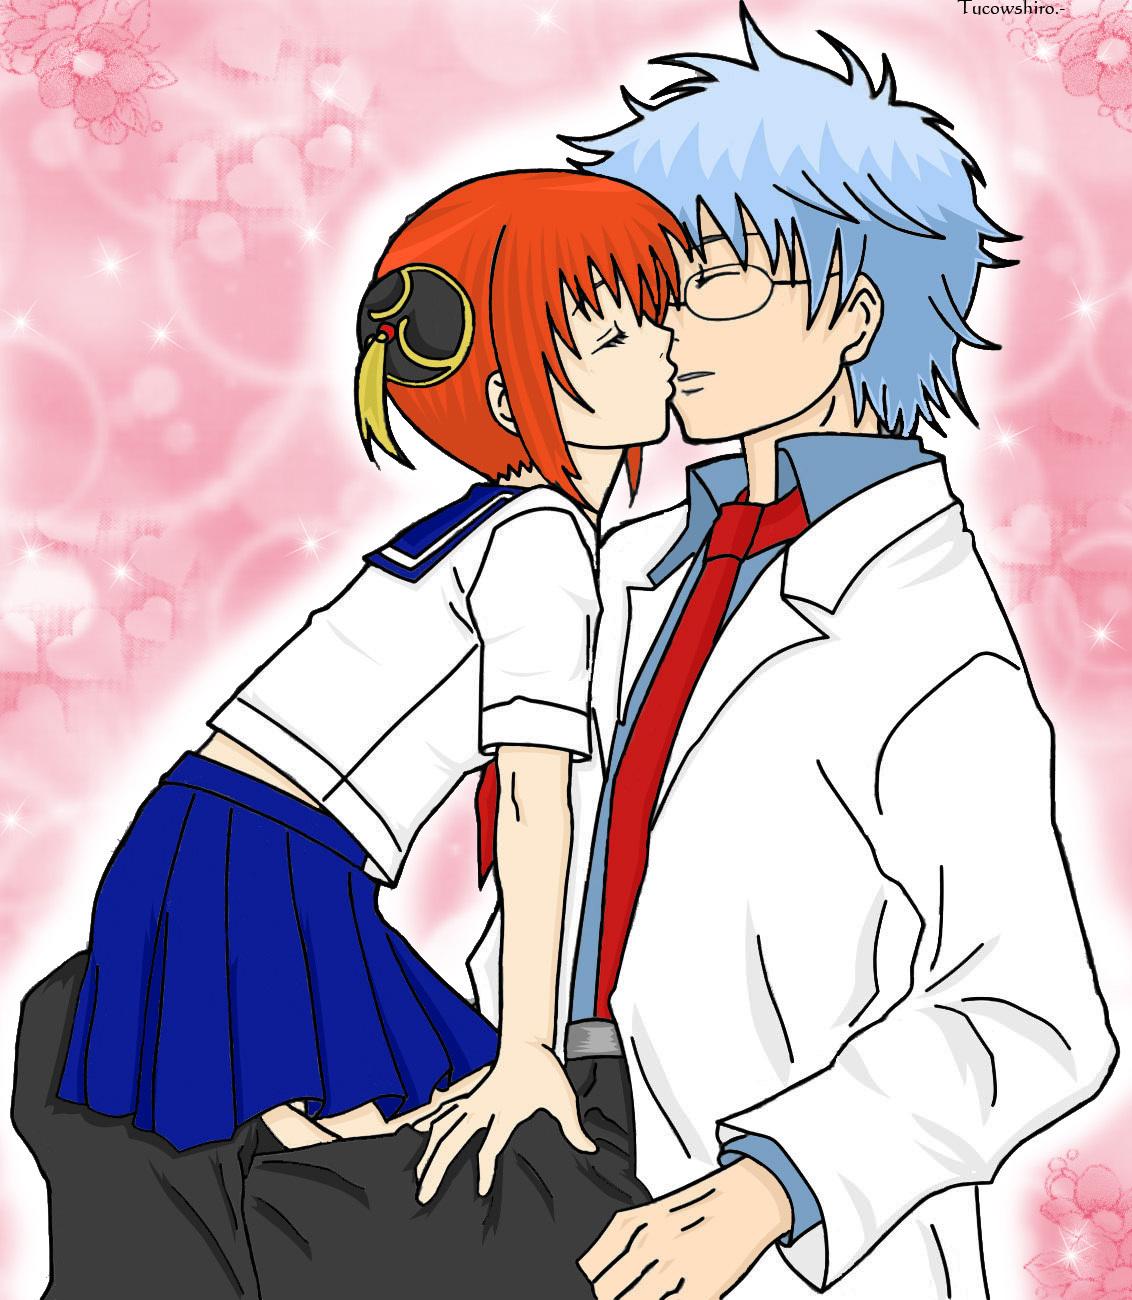 Gintoki x Kagura Gintoki x Kagura Kiss Gintoki And Kagura